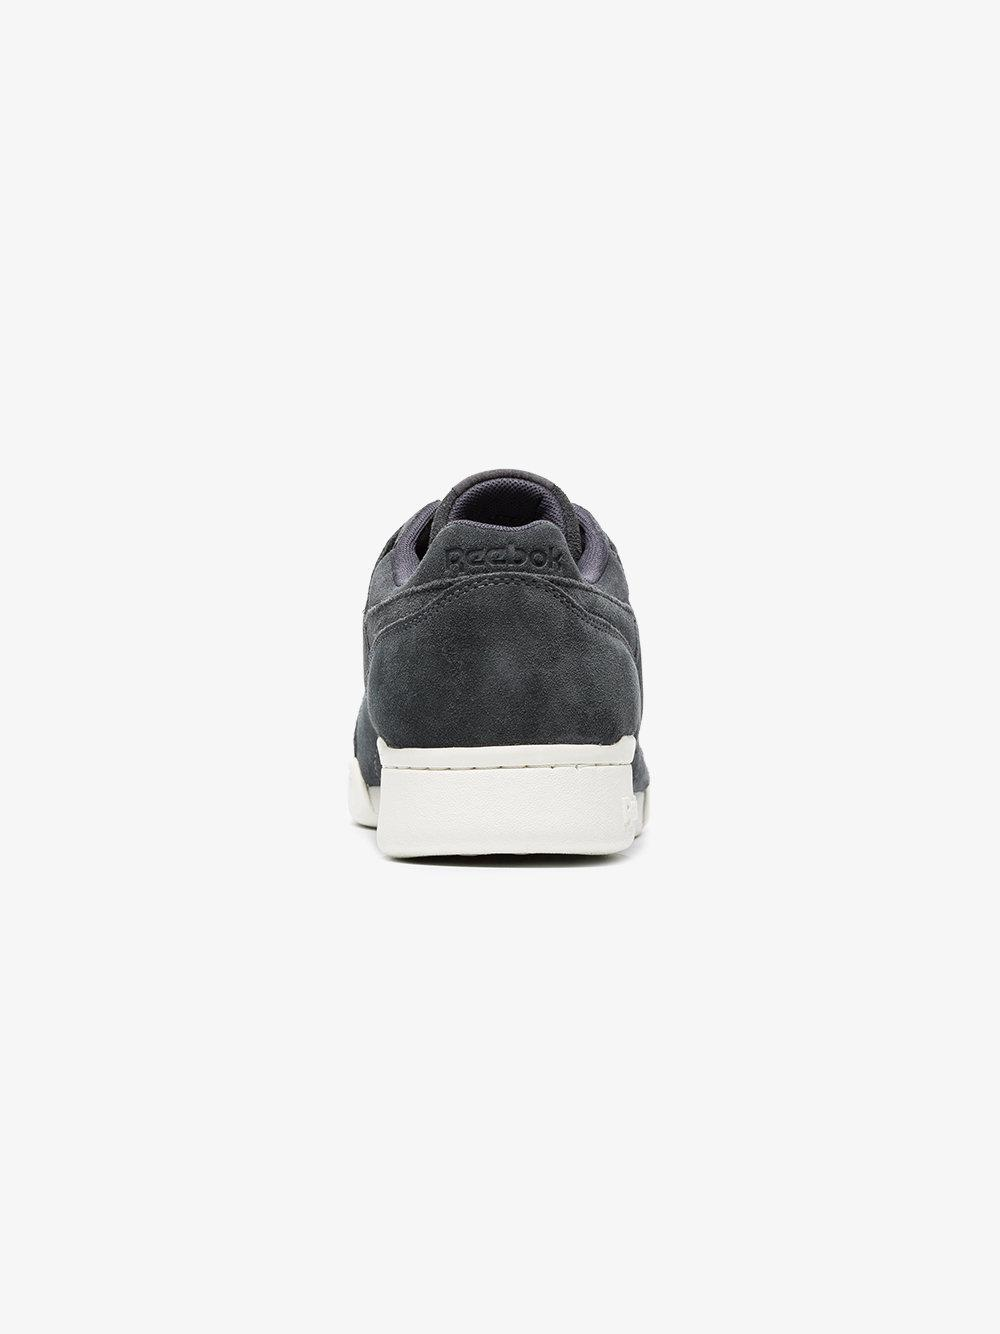 56cccaa9150 Lyst - Reebok Black Workout Plus Mcc Suede Sneakers in Black for Men